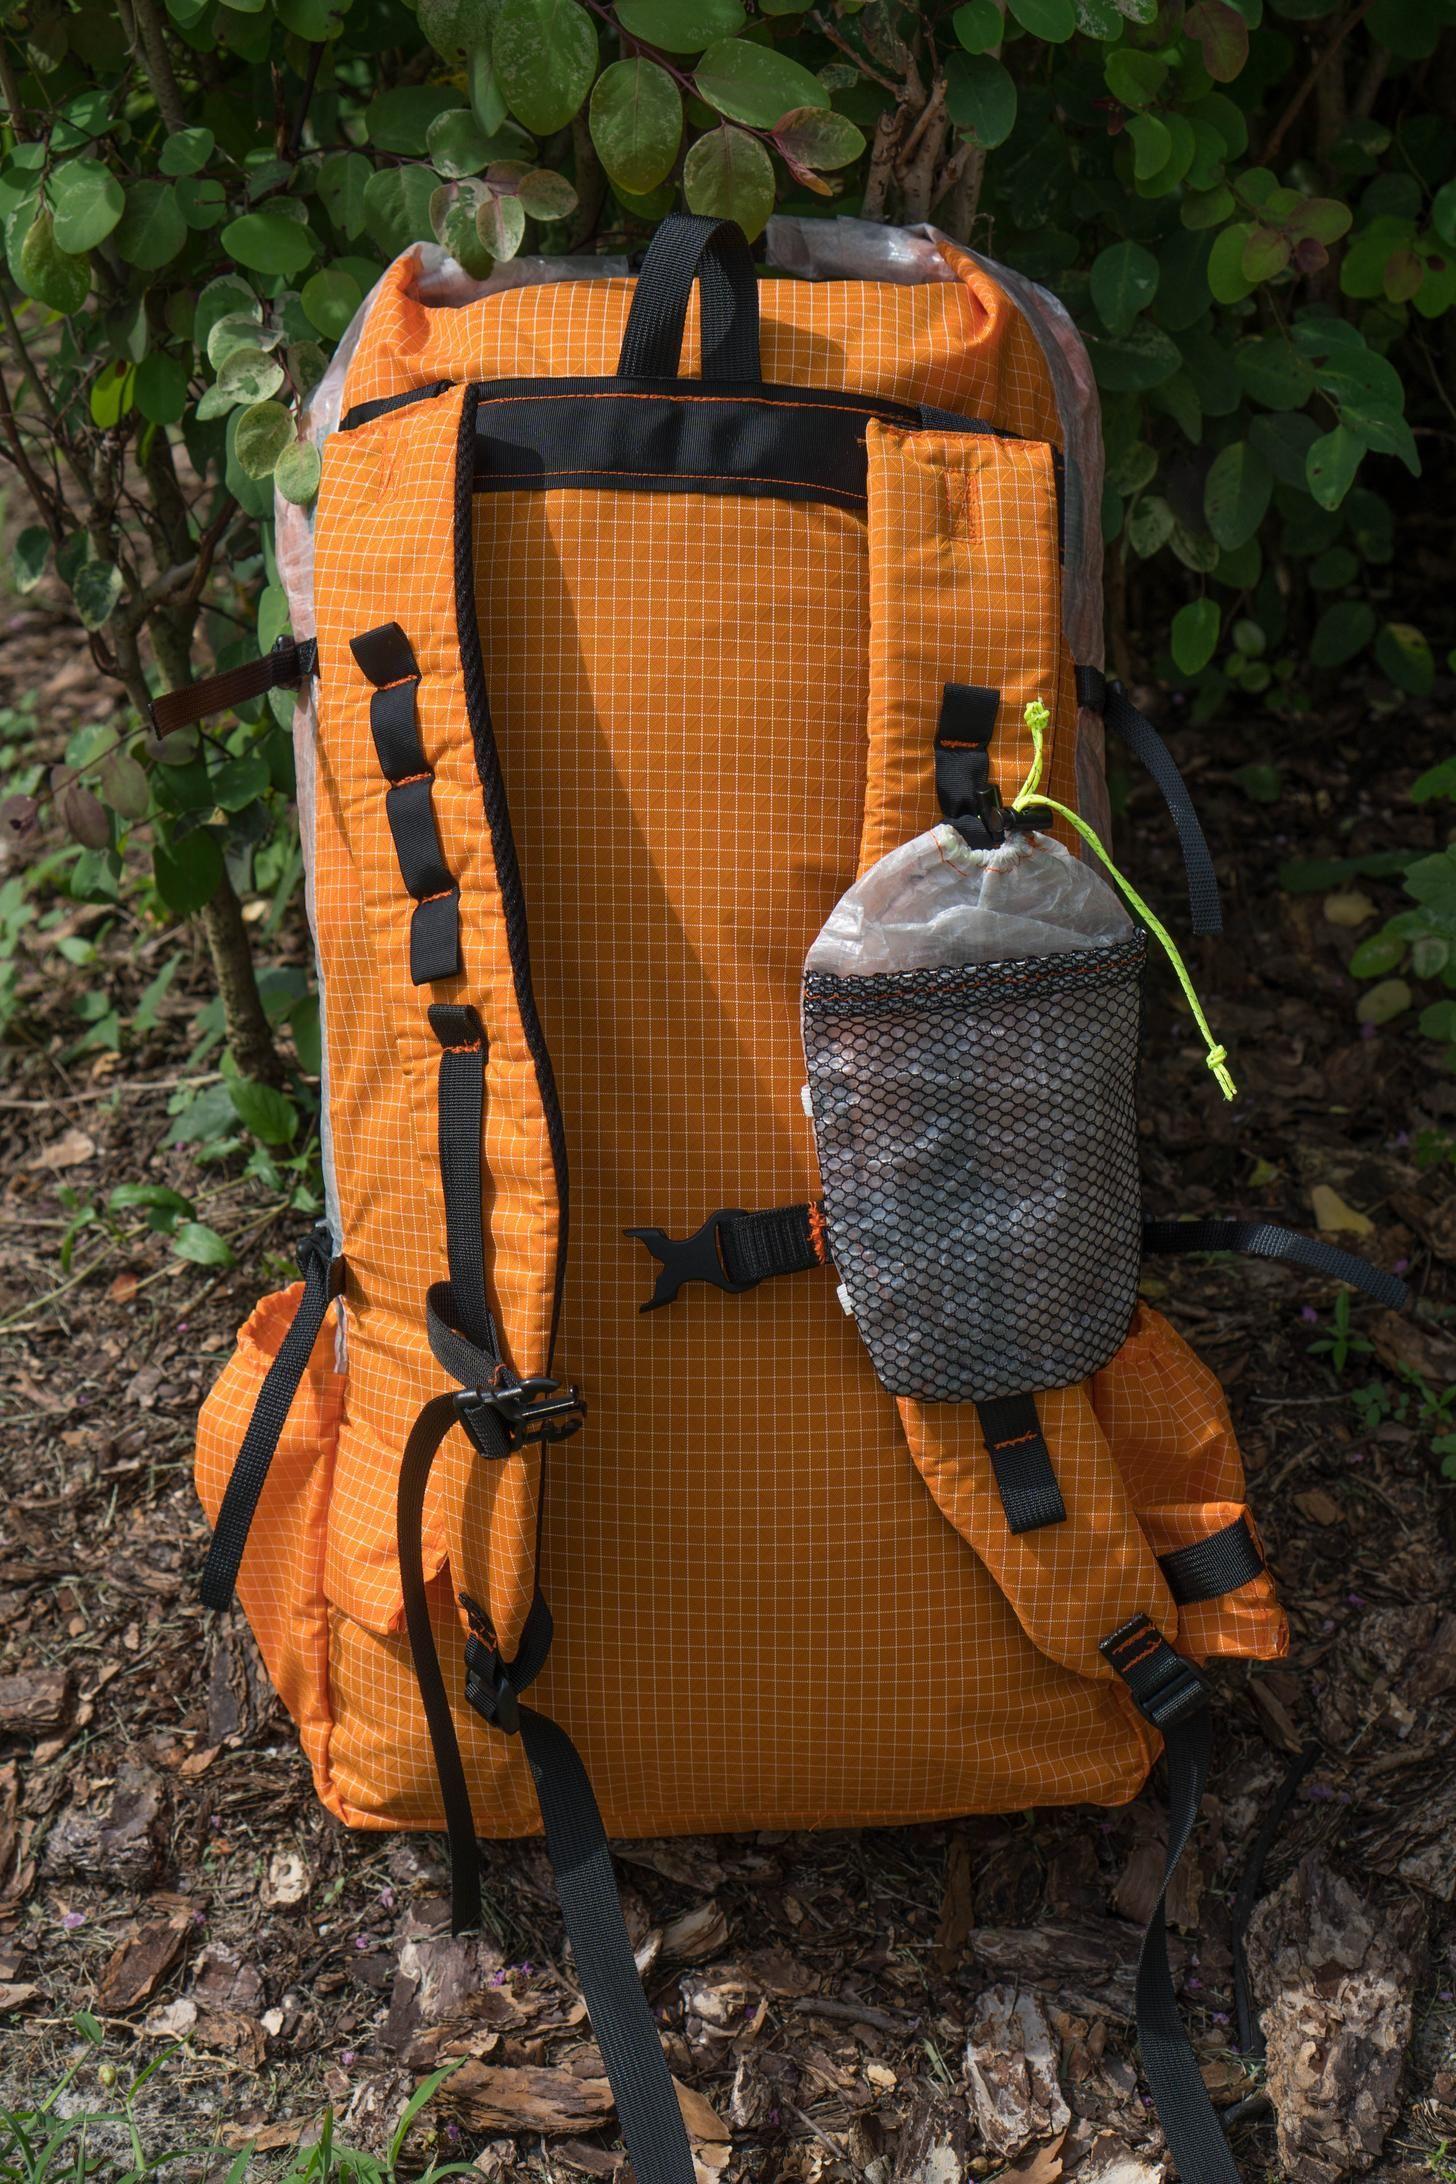 Cuben Fiber And Dyneema X Ultralight Backpack 11oz En 2020 Sac A Dos Sac